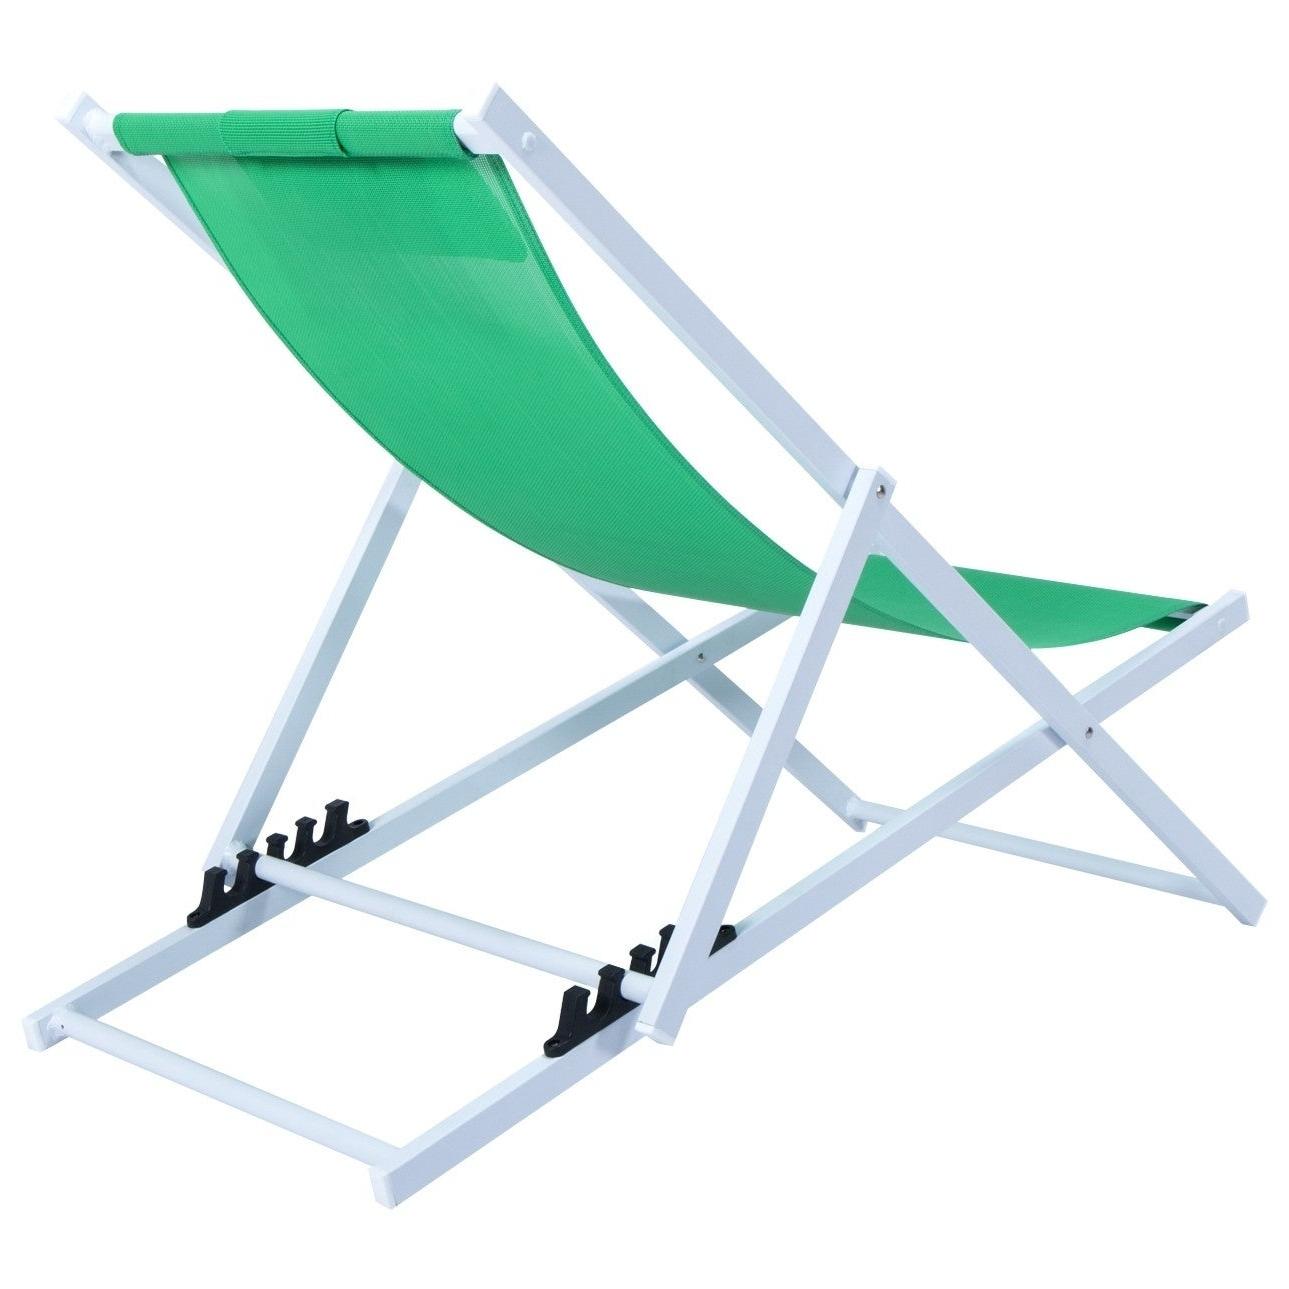 Latest Leisuremod Sunset Patio Sling Folding Chair Adjustable With Headrest Inside Sunset Patio Sling Folding Chairs With Headrest (View 4 of 25)